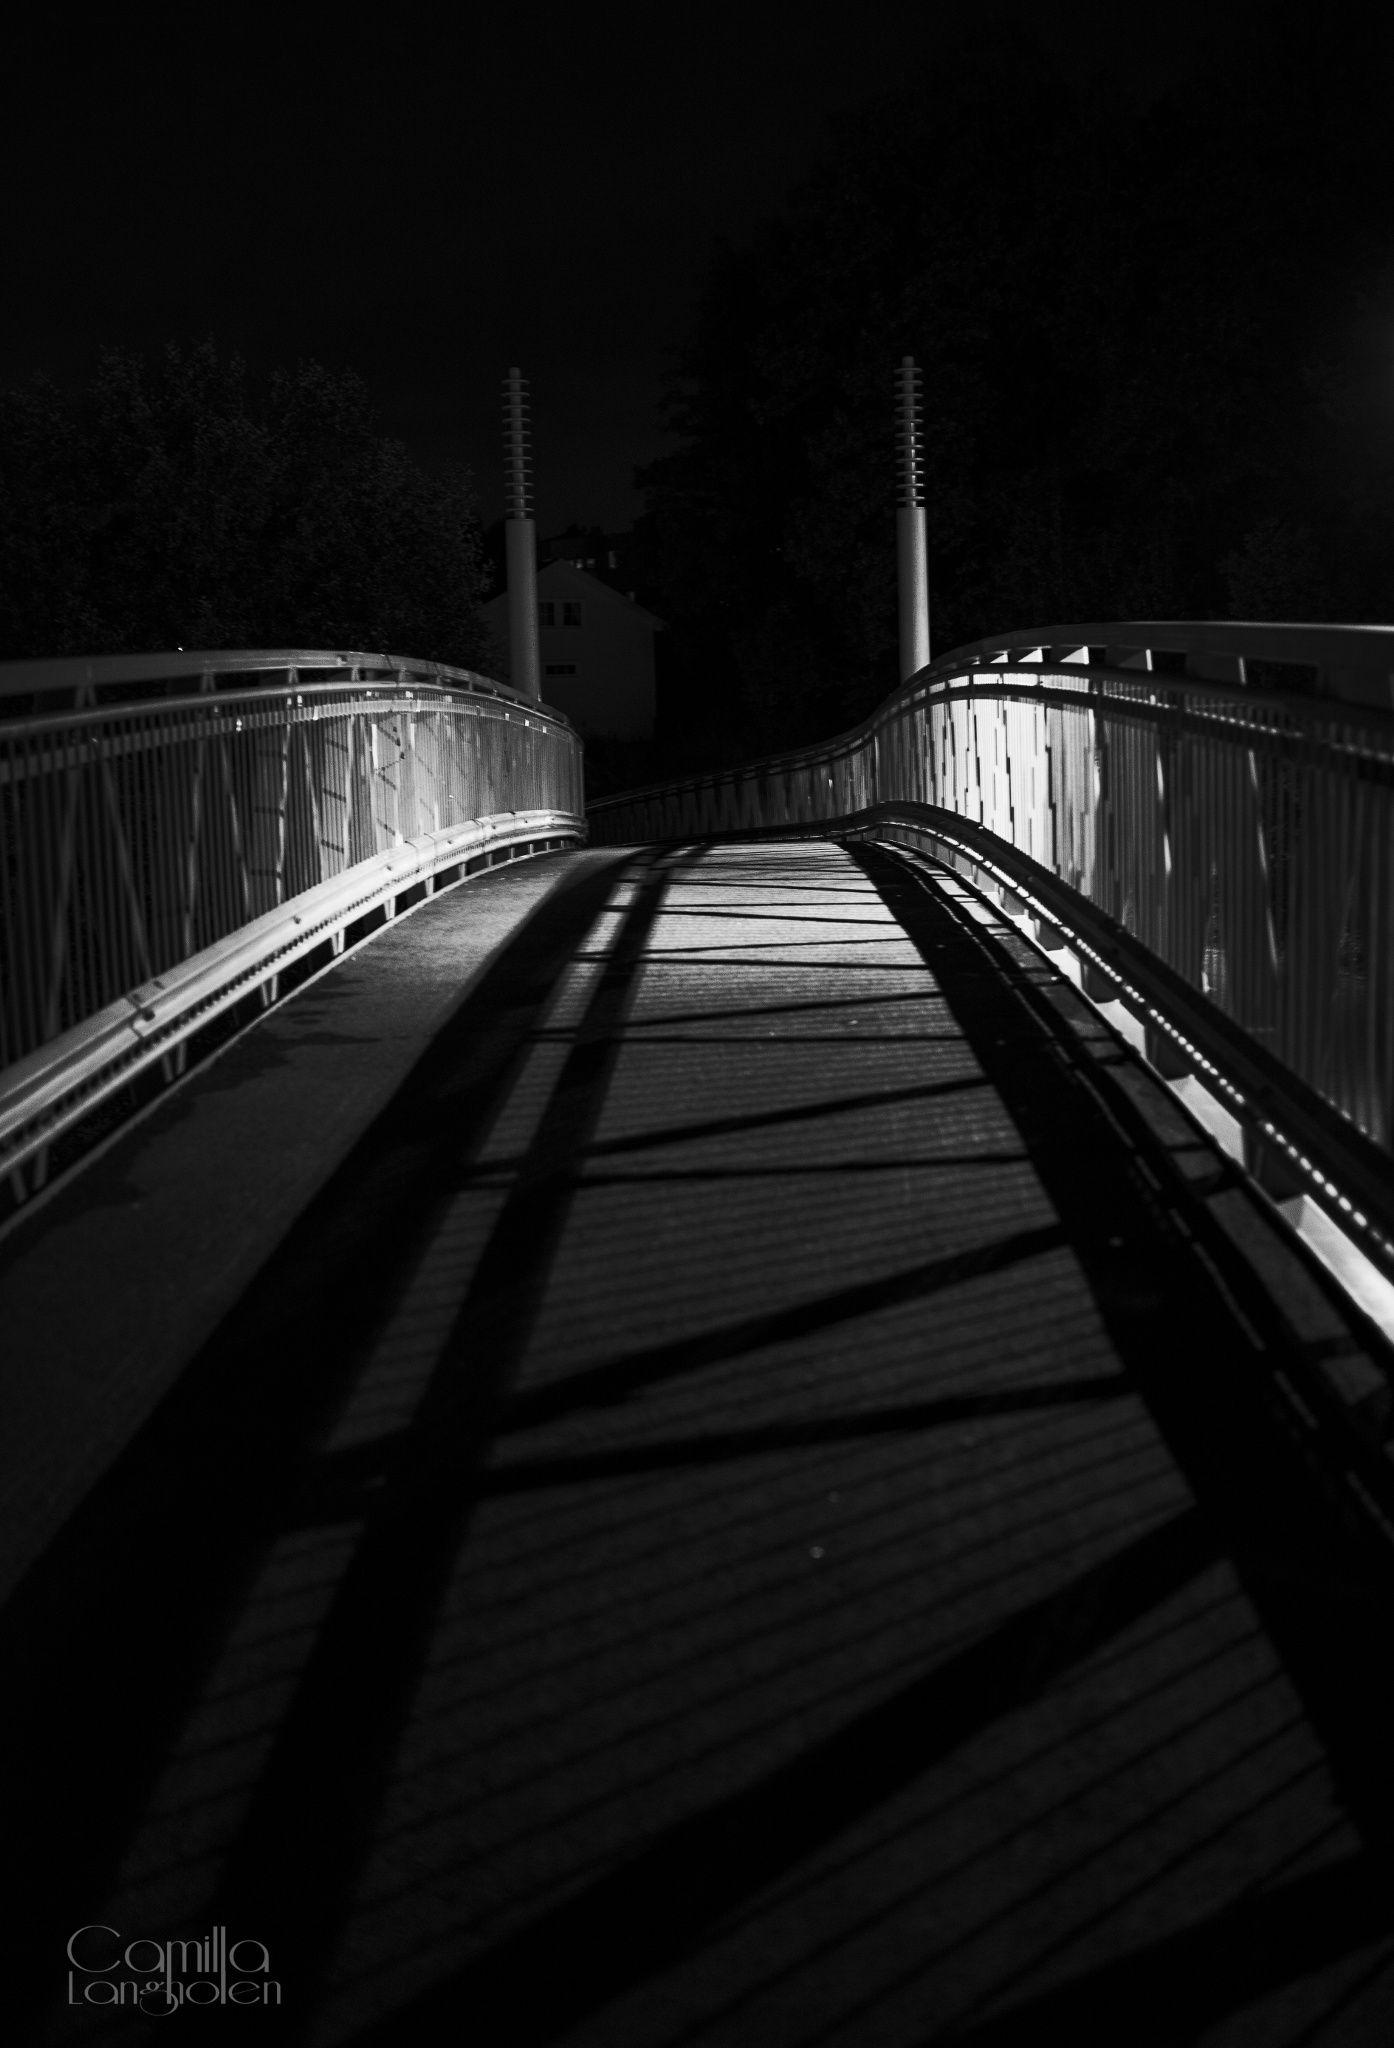 Bridge by Camilla Langholen on 500px